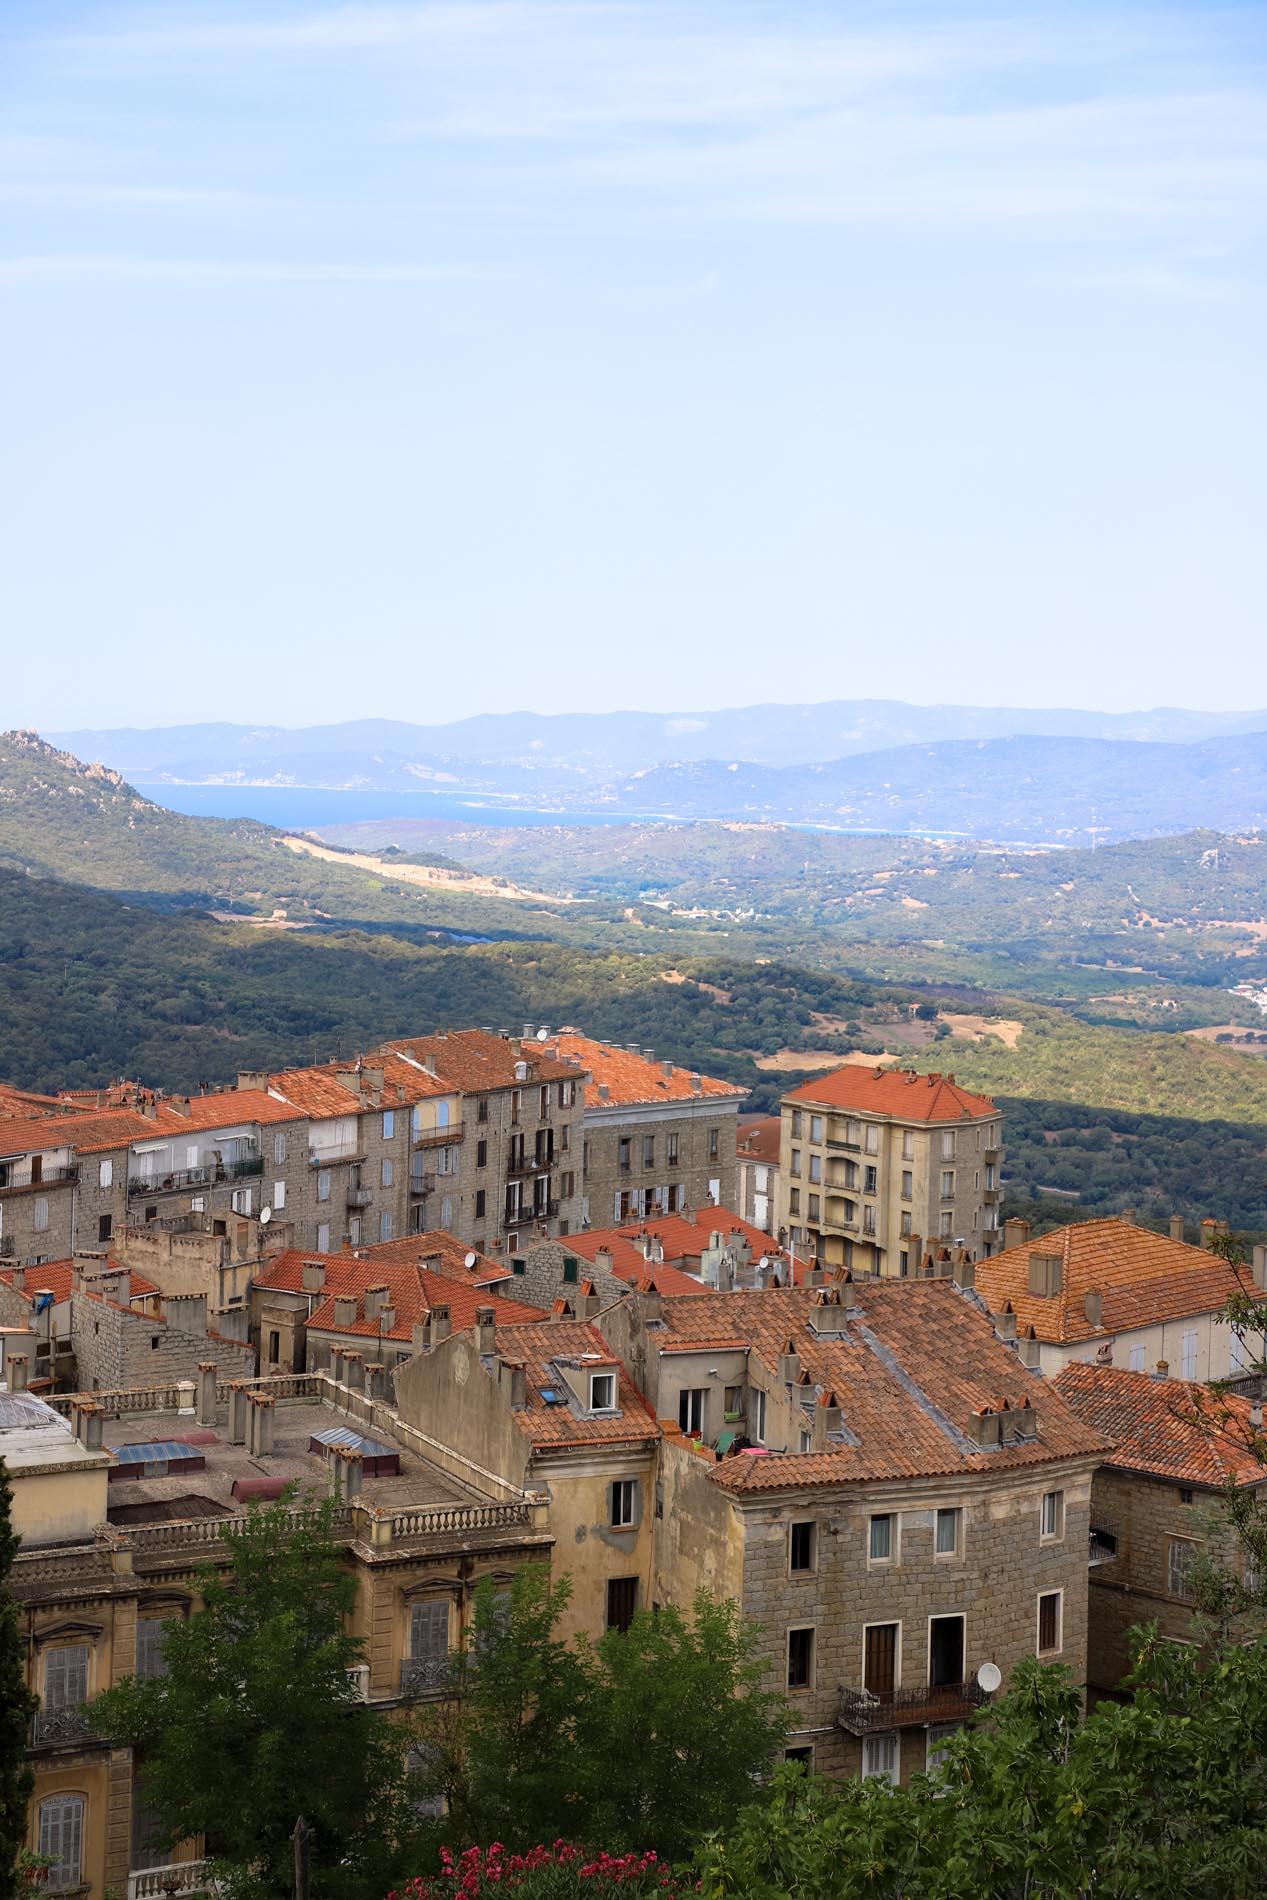 Vue sur Sartene en Corse